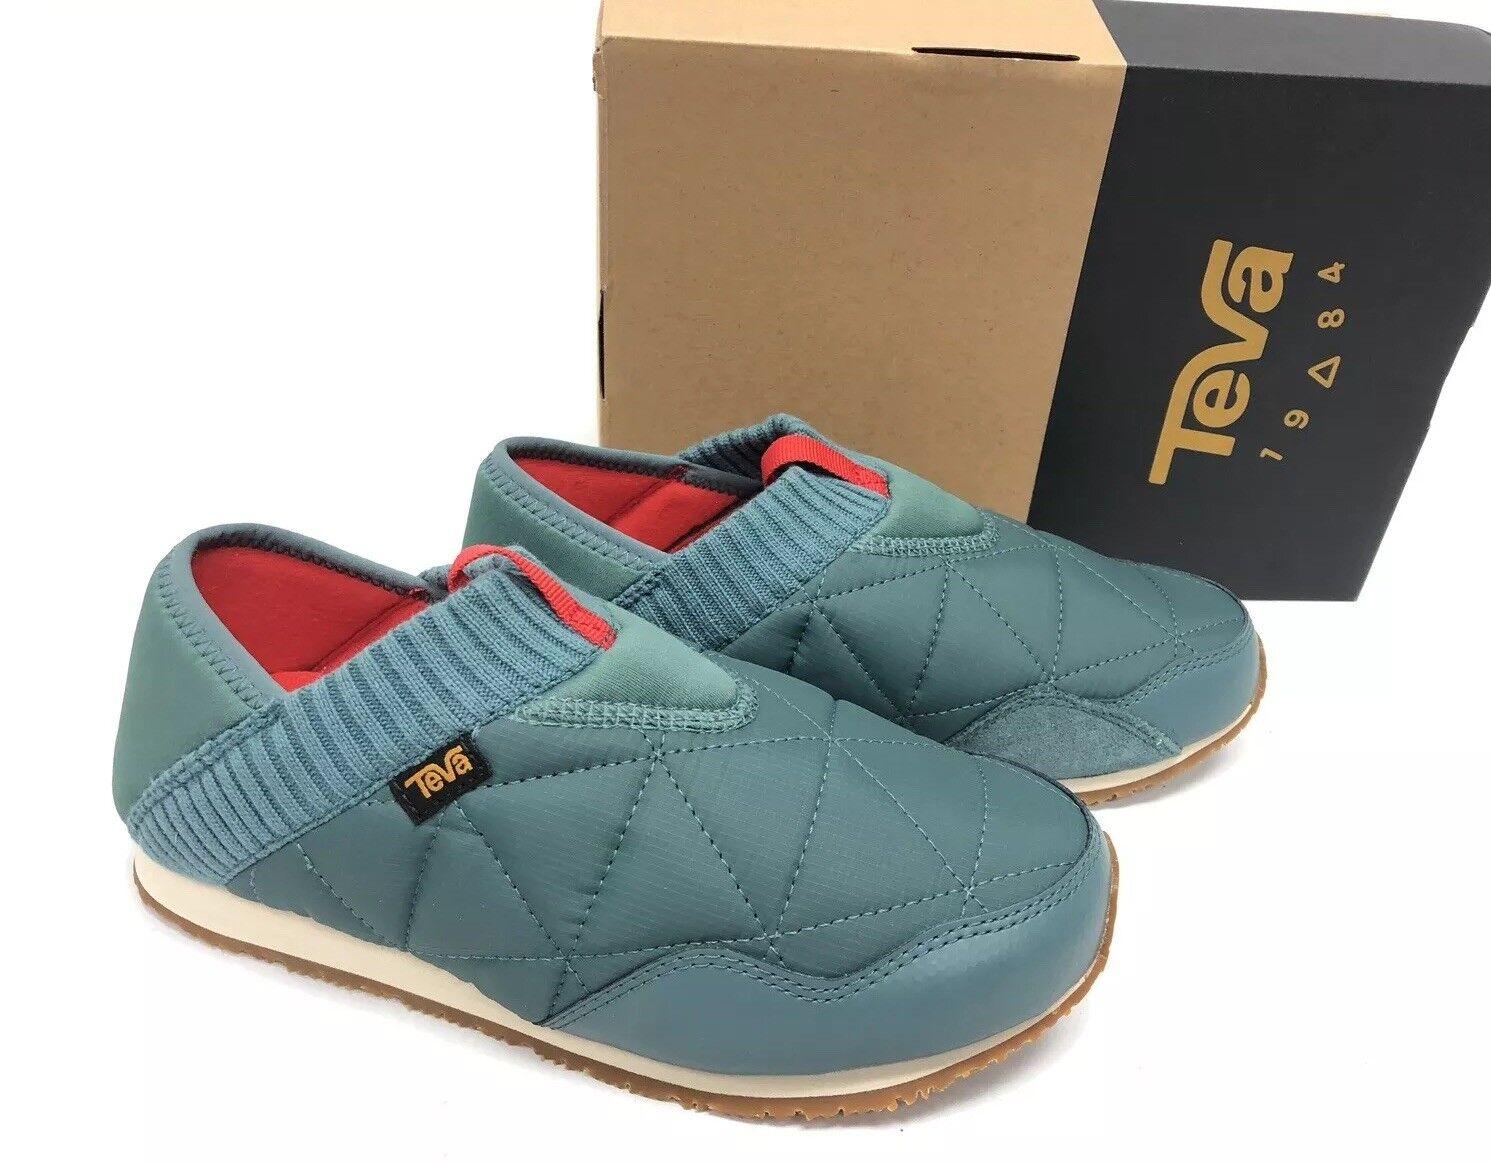 Teva Women's Ember Moc Slip-On Drop-In Slipper Sneaker North Atlantic 1018225